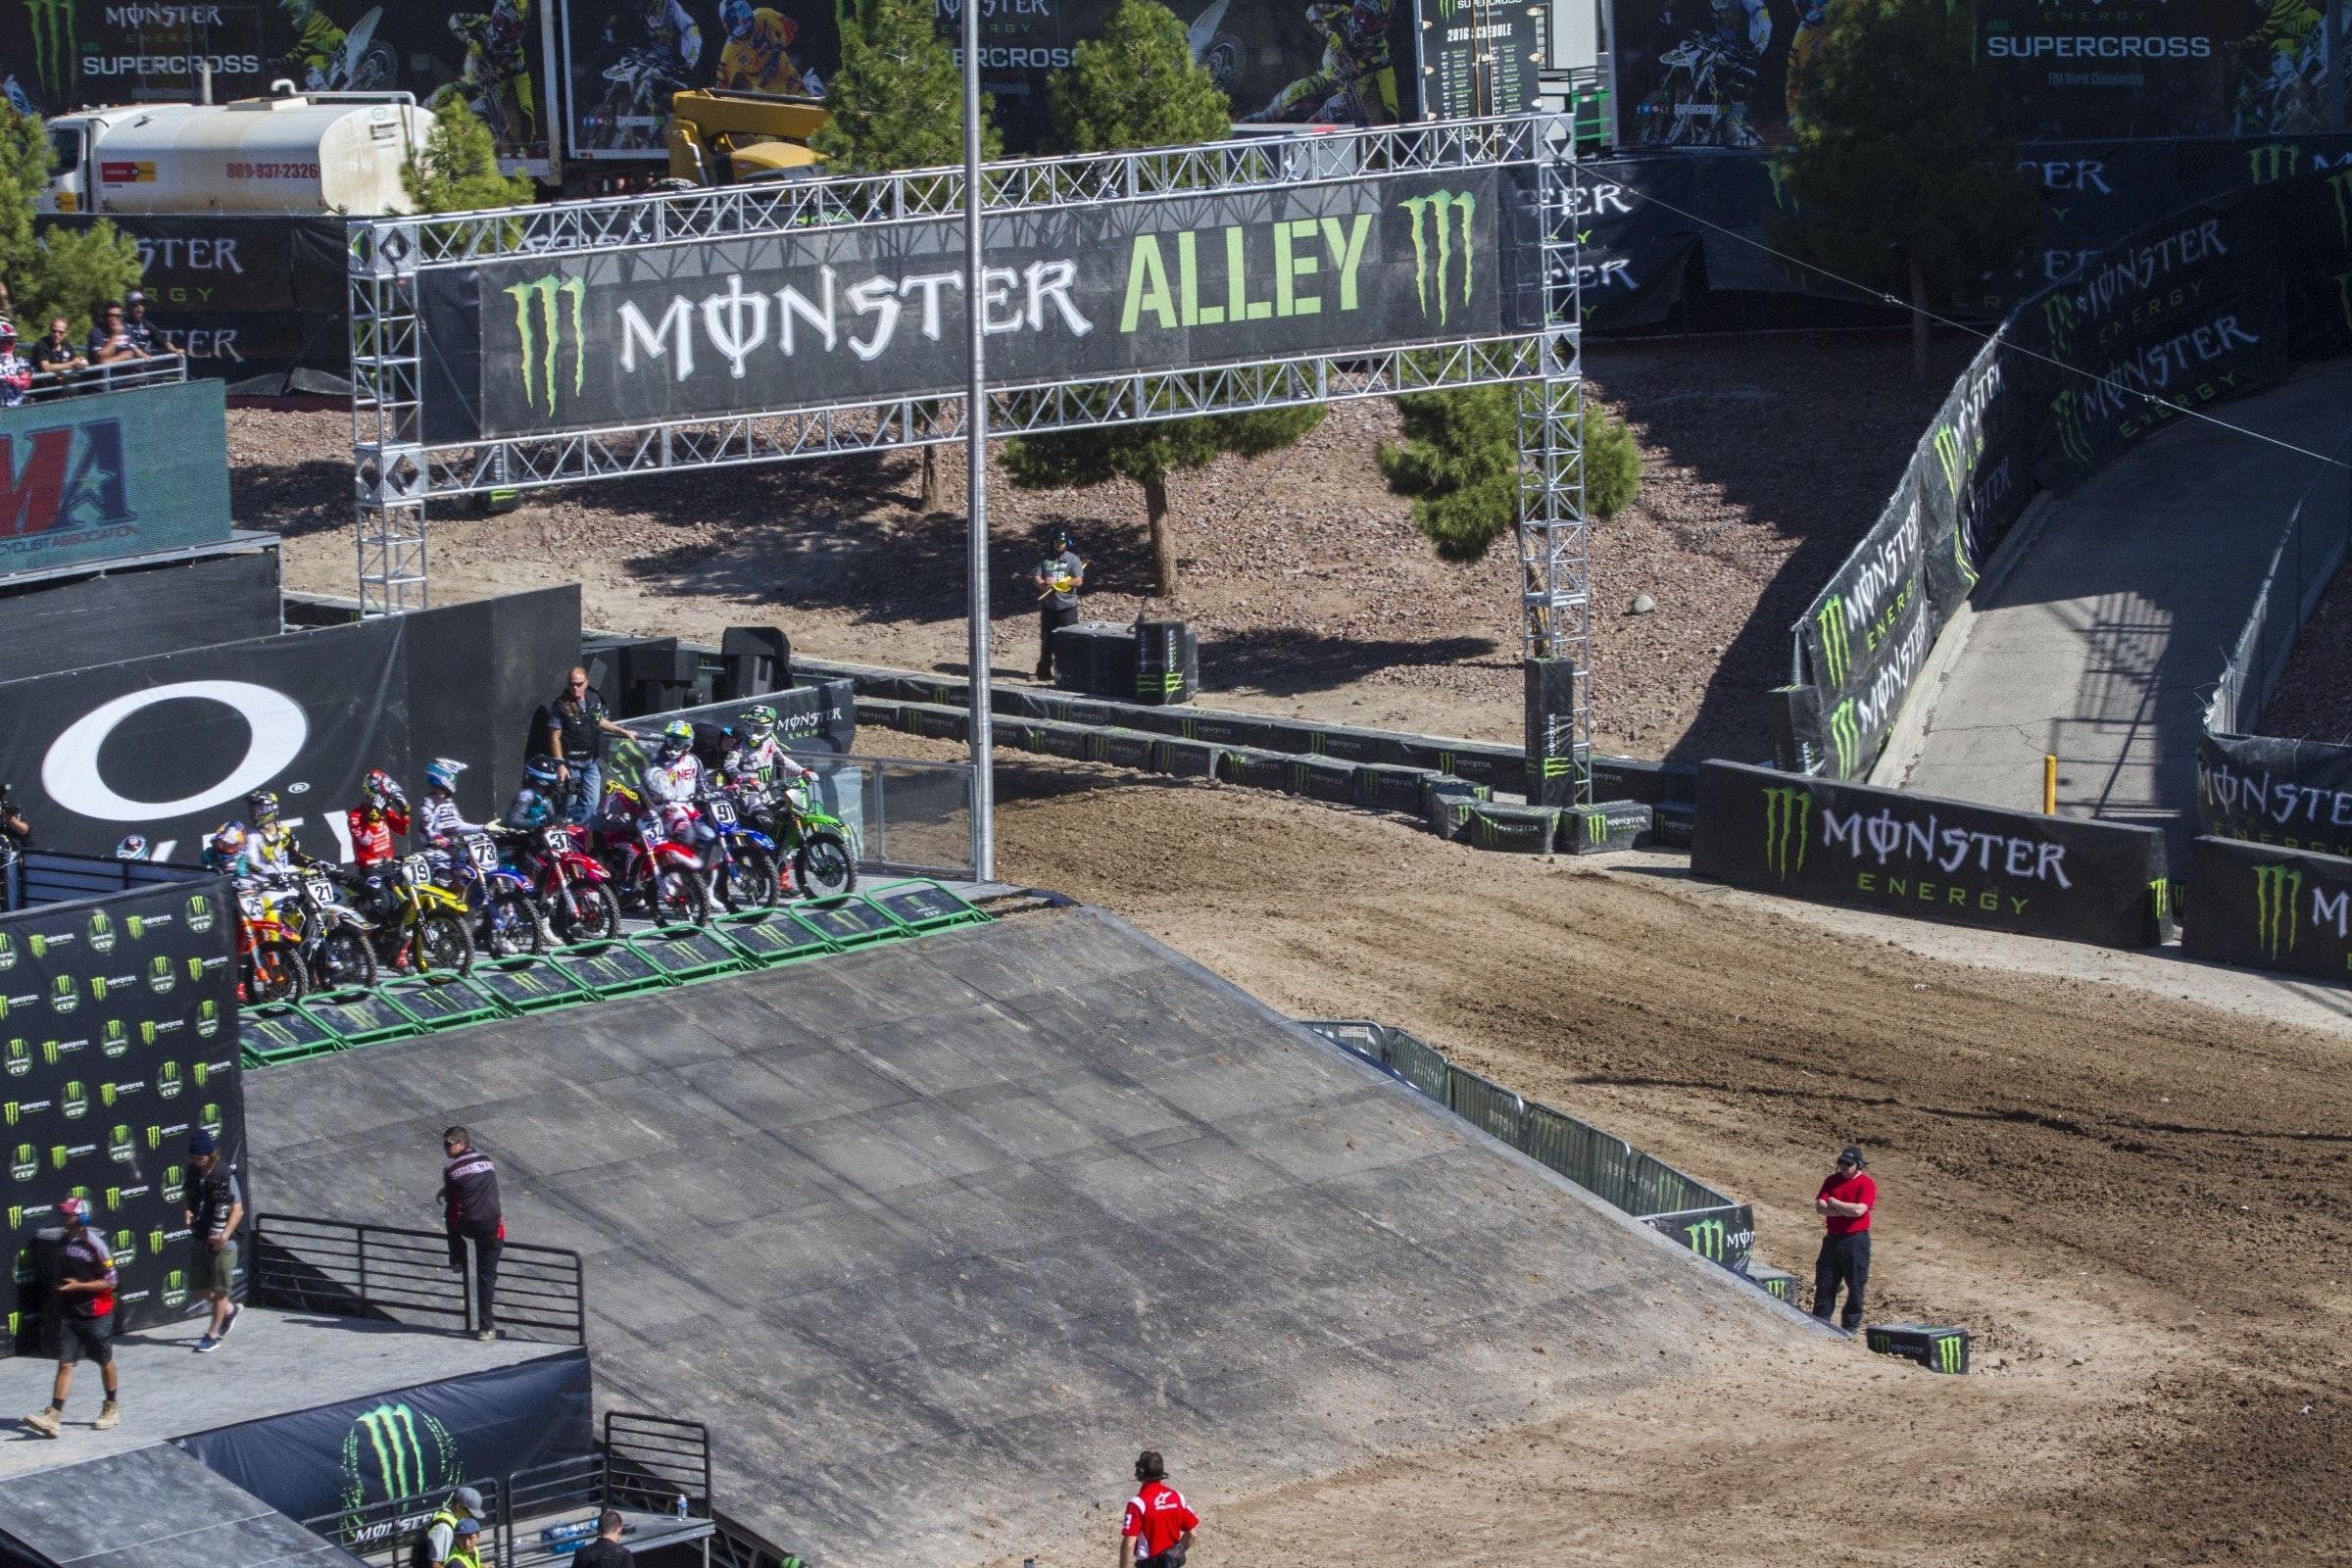 Honda Atv Dealer Las Vegas >> Race Day Feed: Monster Energy Cup - Al Lamb's Dallas Honda   New and Used Motorcycle Dealer ...